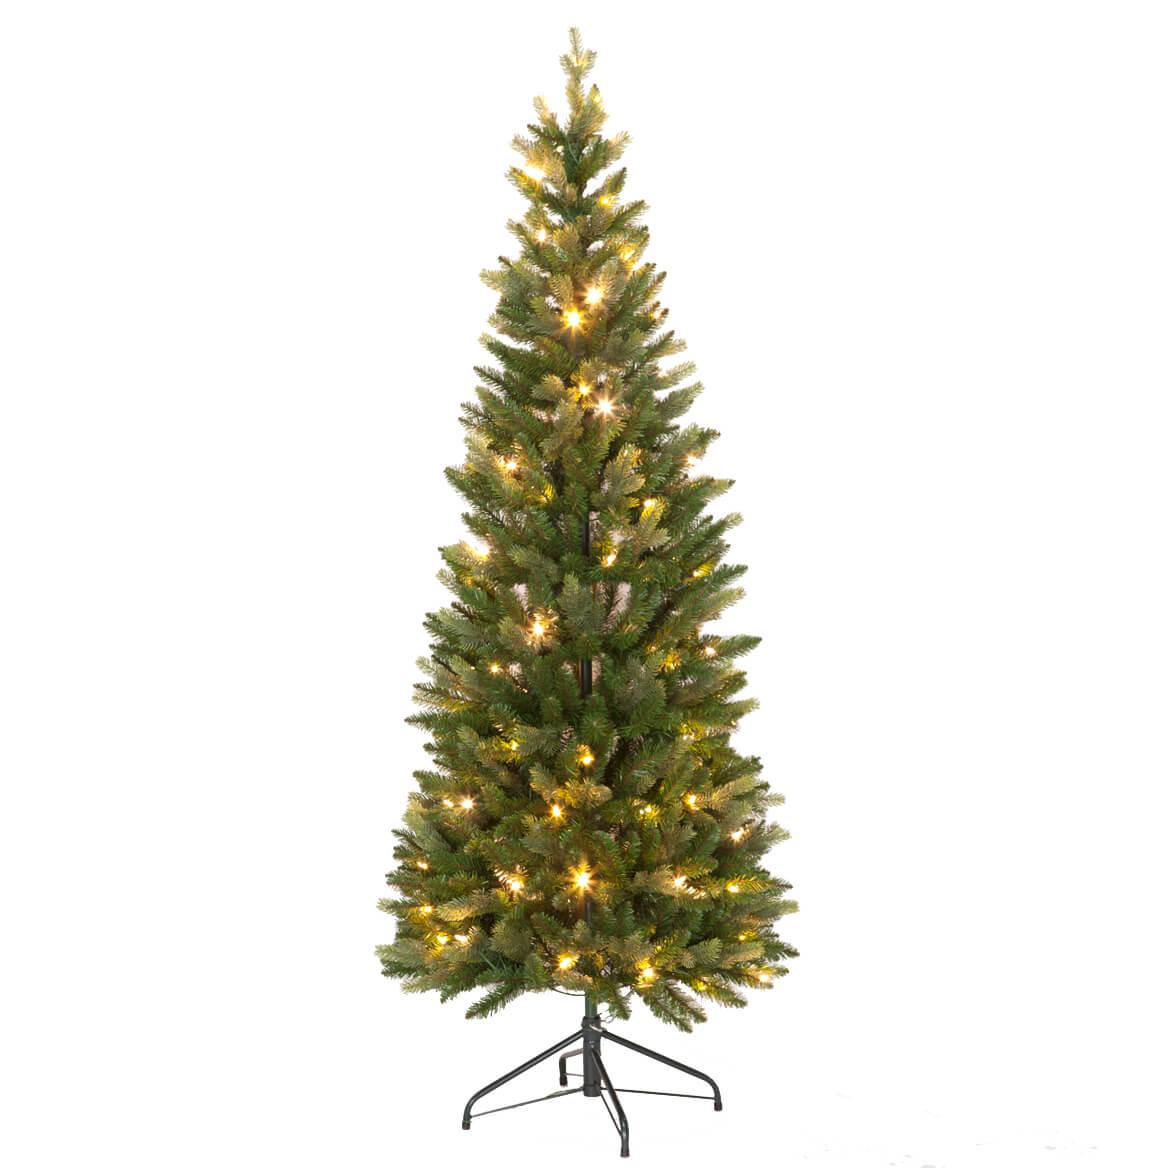 6' Pre-Lit Fraiser-Like Tree by Holiday Peak™-356284